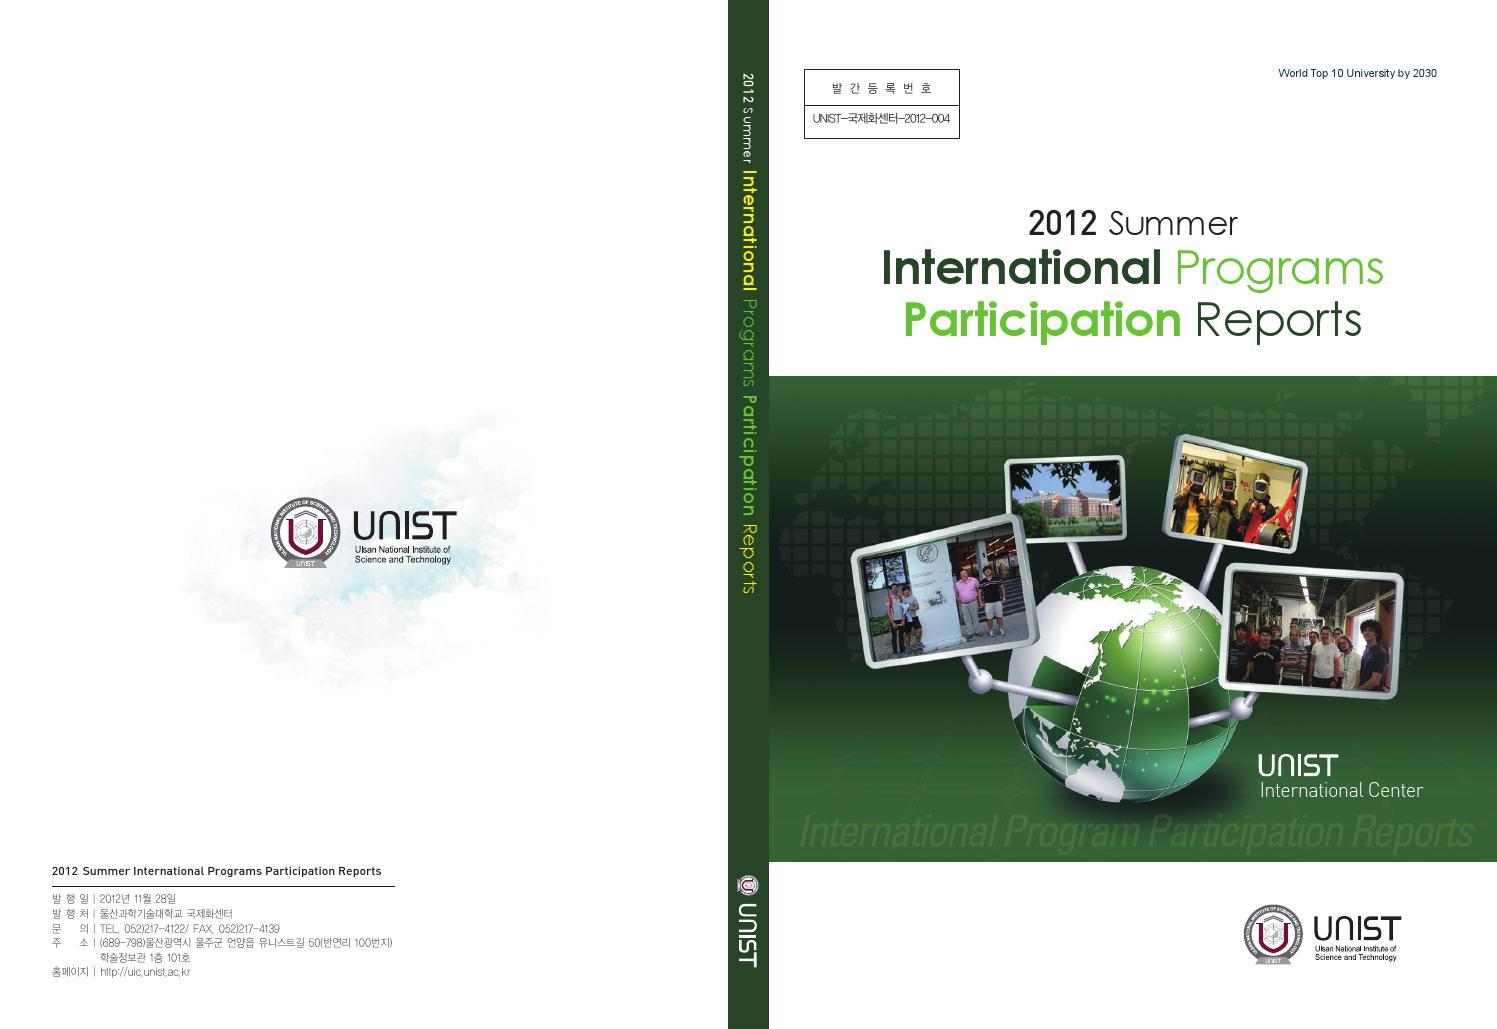 2012 Summer International Programs Participation Reports